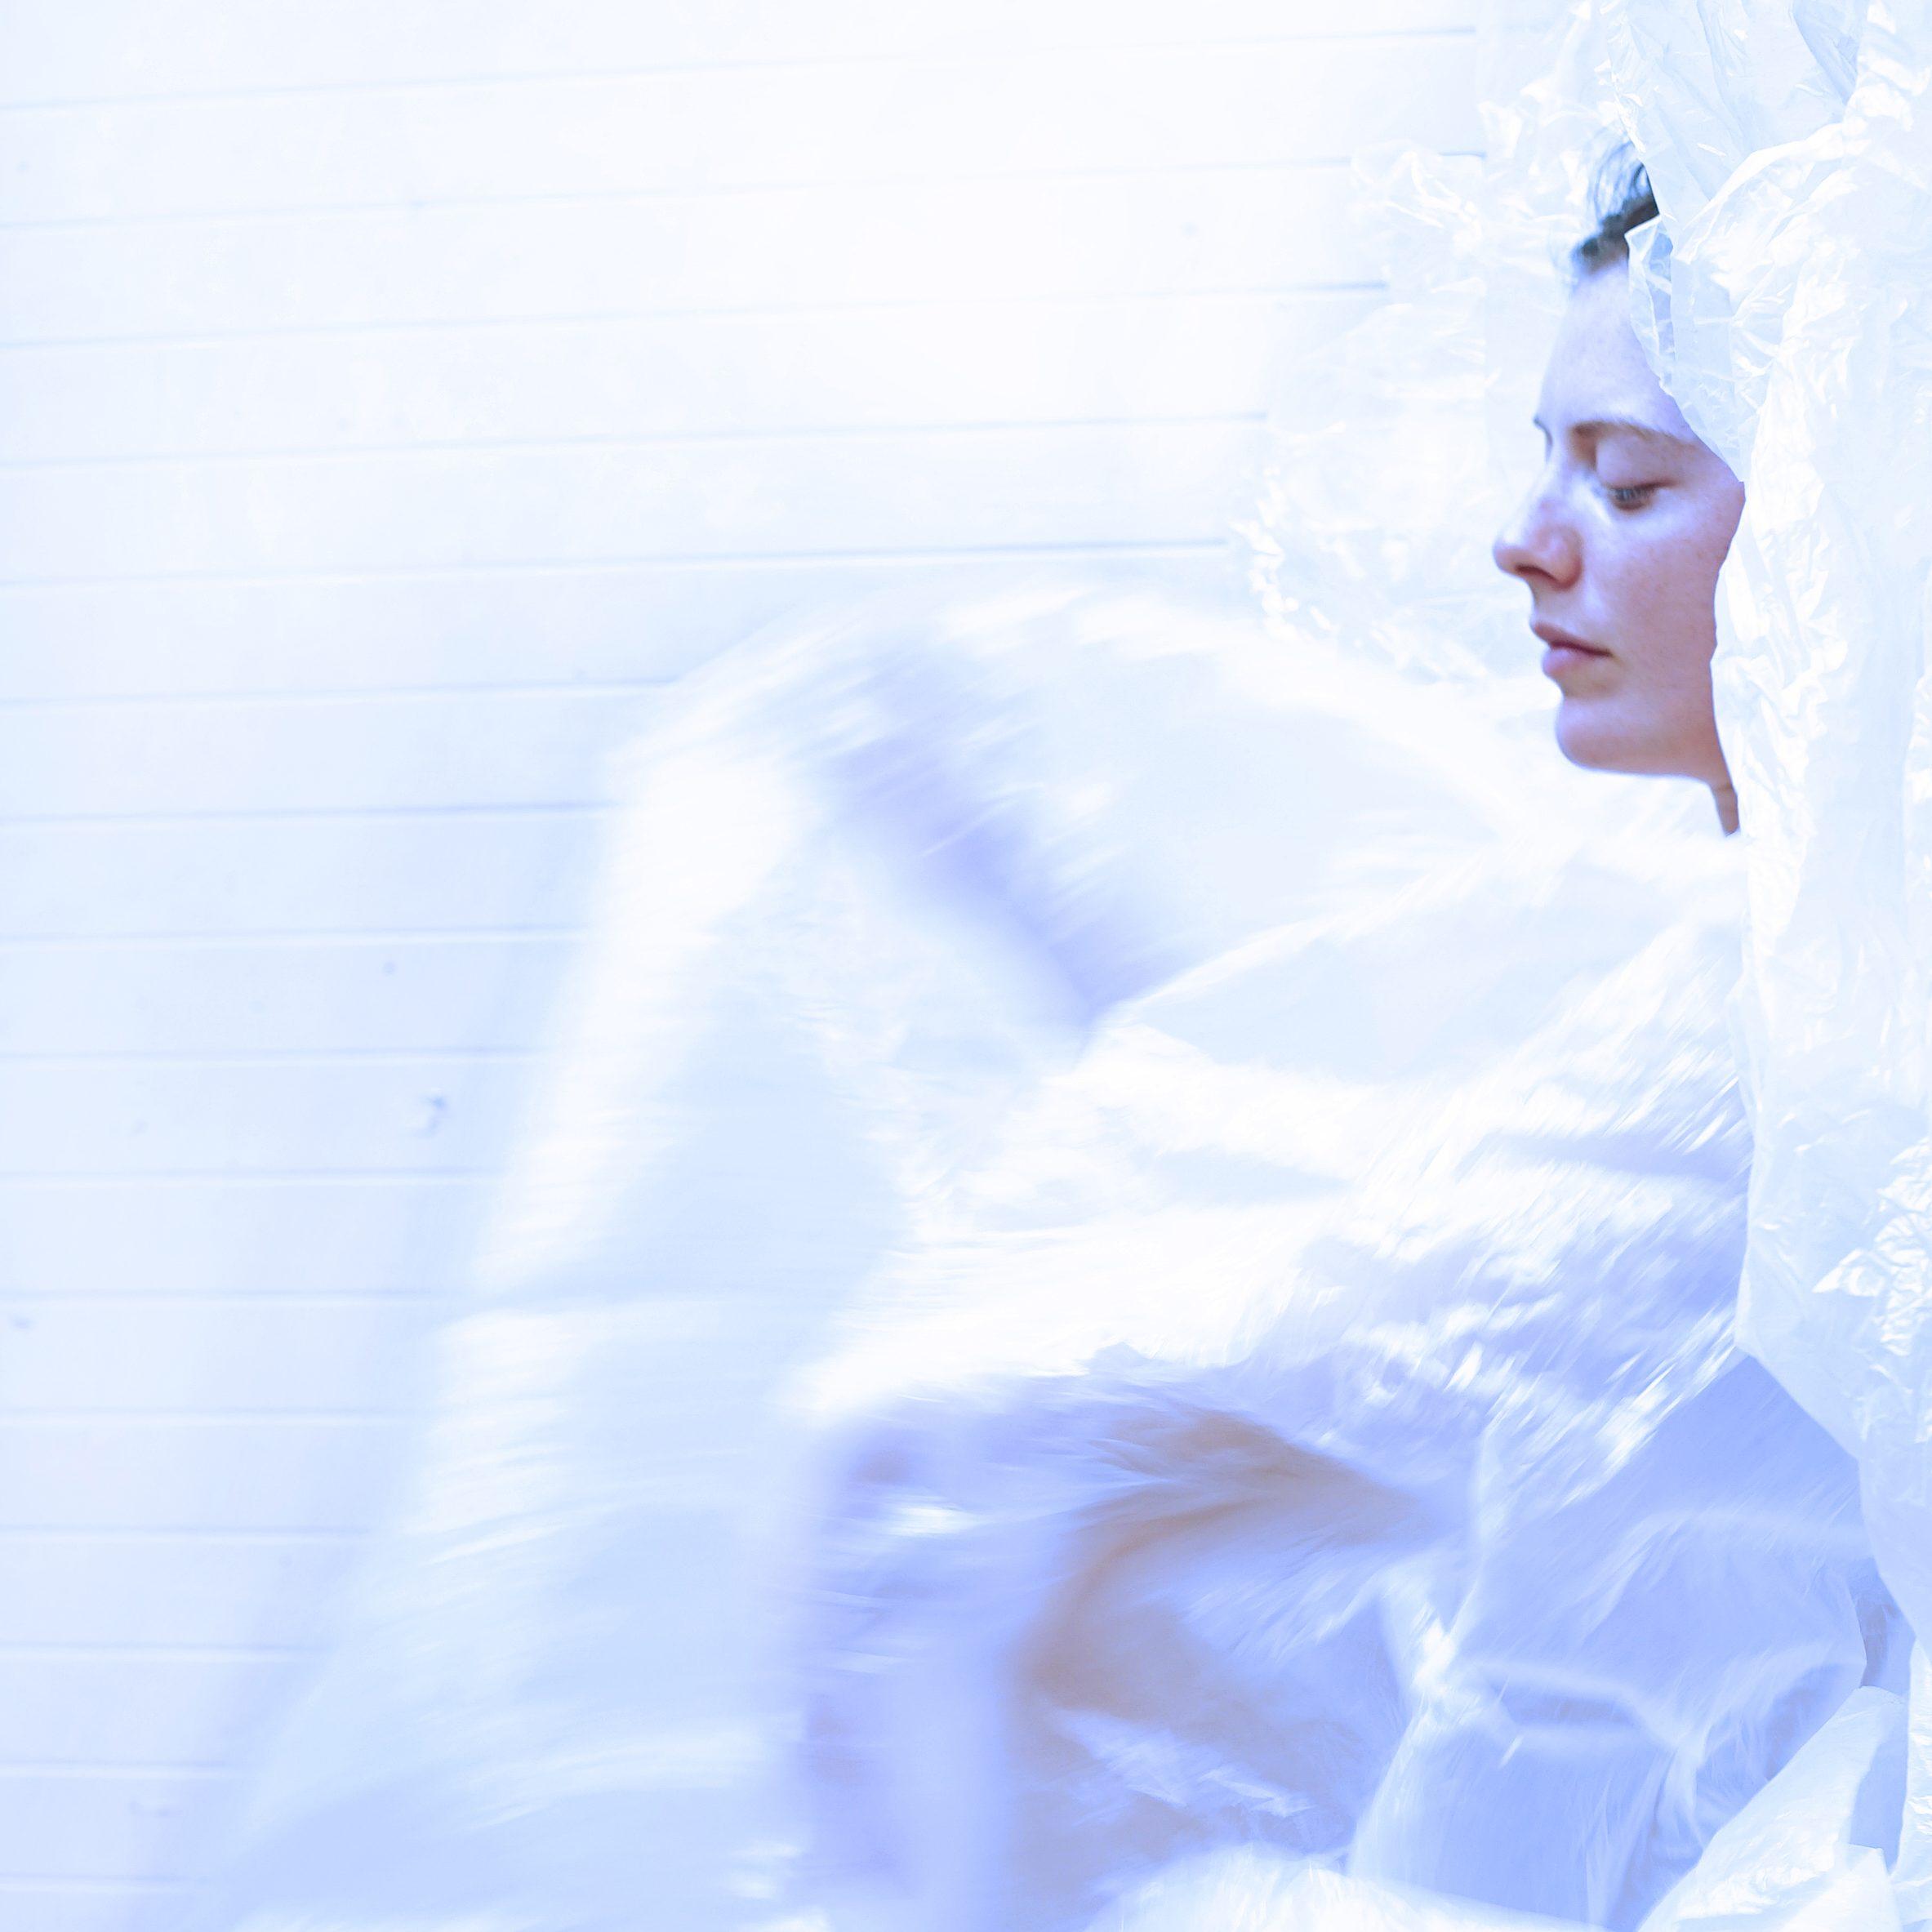 Dance artist Kellie McInnes covered in bubble wrap